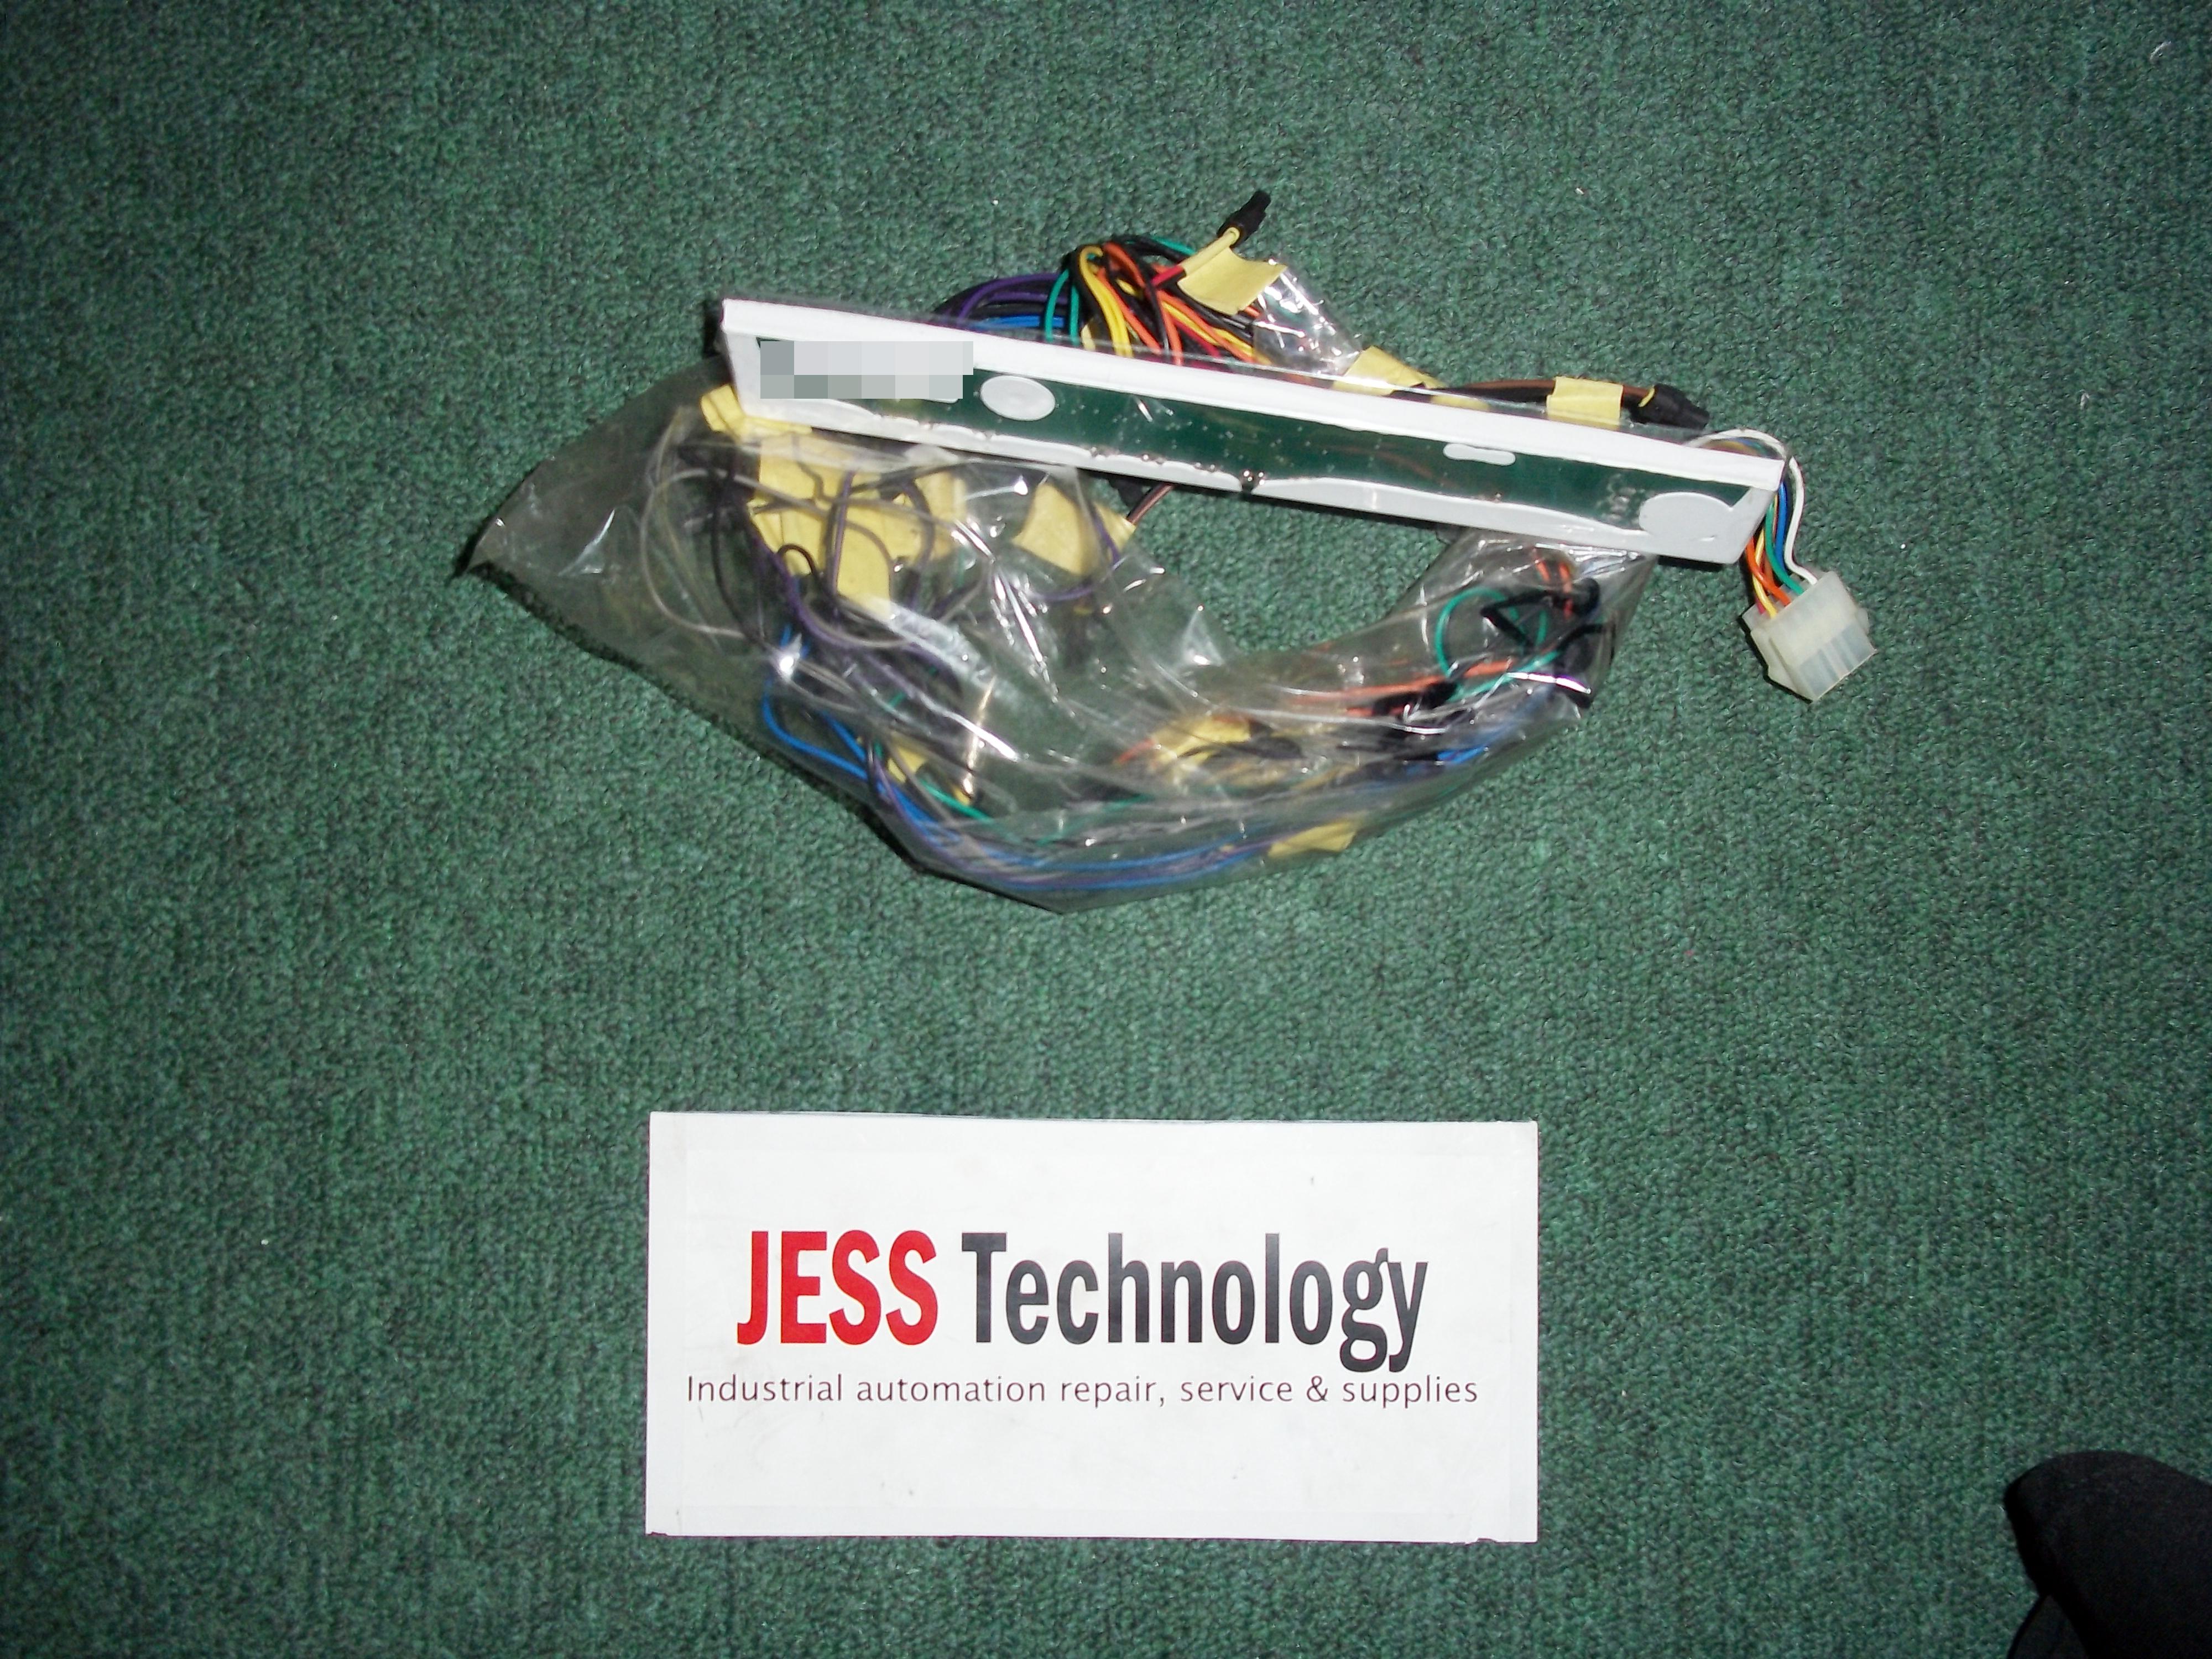 Jess Repair Tru Circuit Board For Fire Truck Engineering Eight Dcs3 Signal In Malaysia Singapore